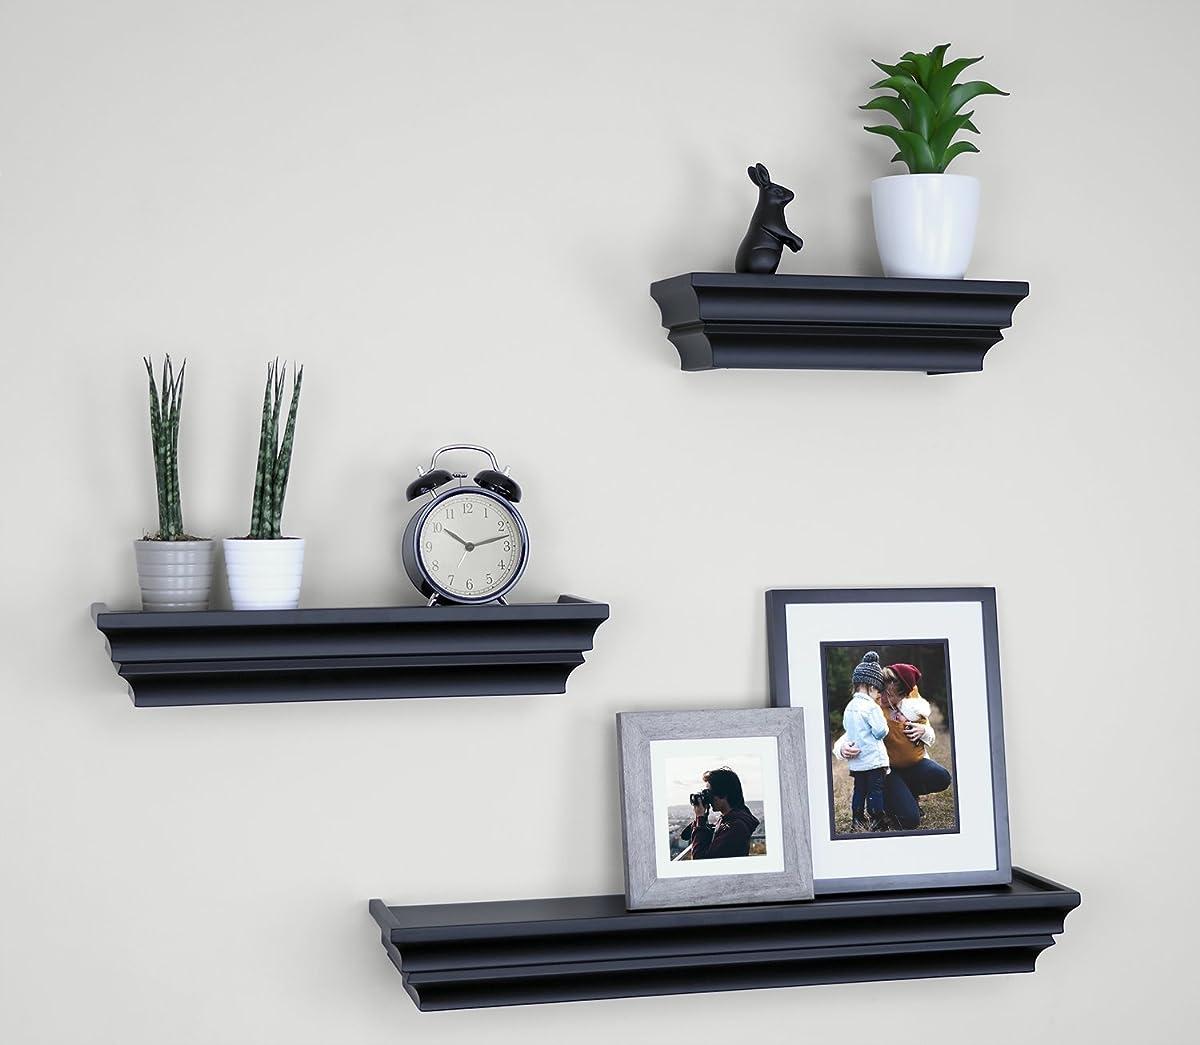 "Ballucci Victorian Wall Ledge and Shelf, 12"", 16"", 24"", Set of 3, Black"